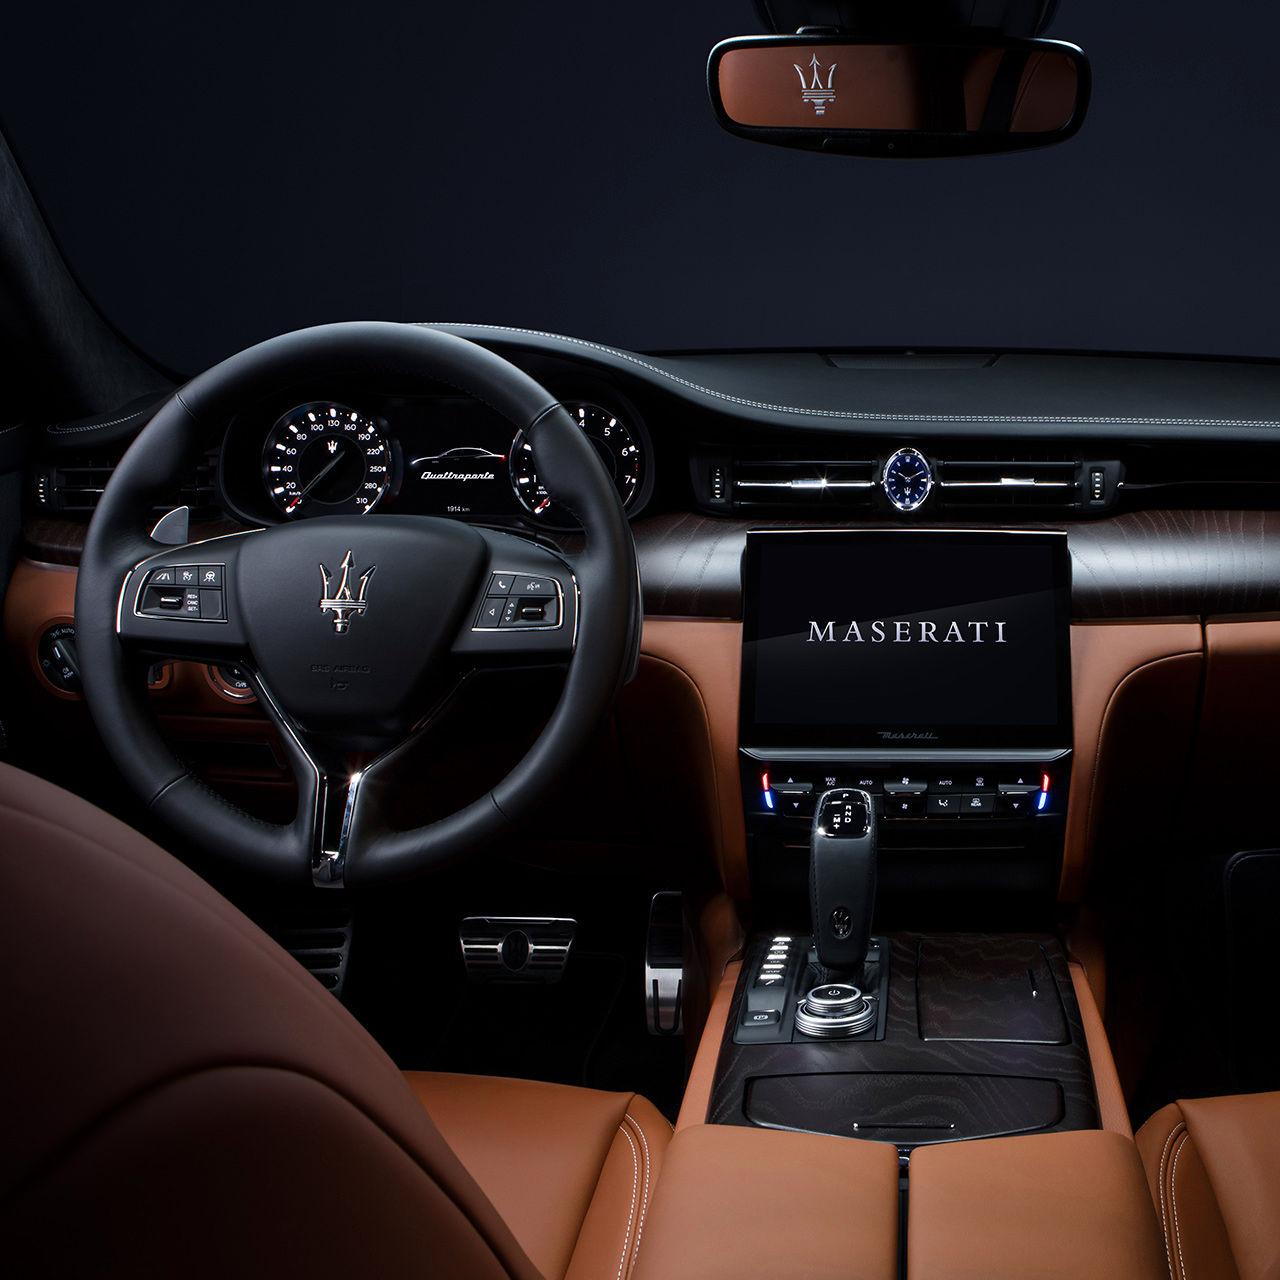 Maserati Quattroporte - Design Cockpit